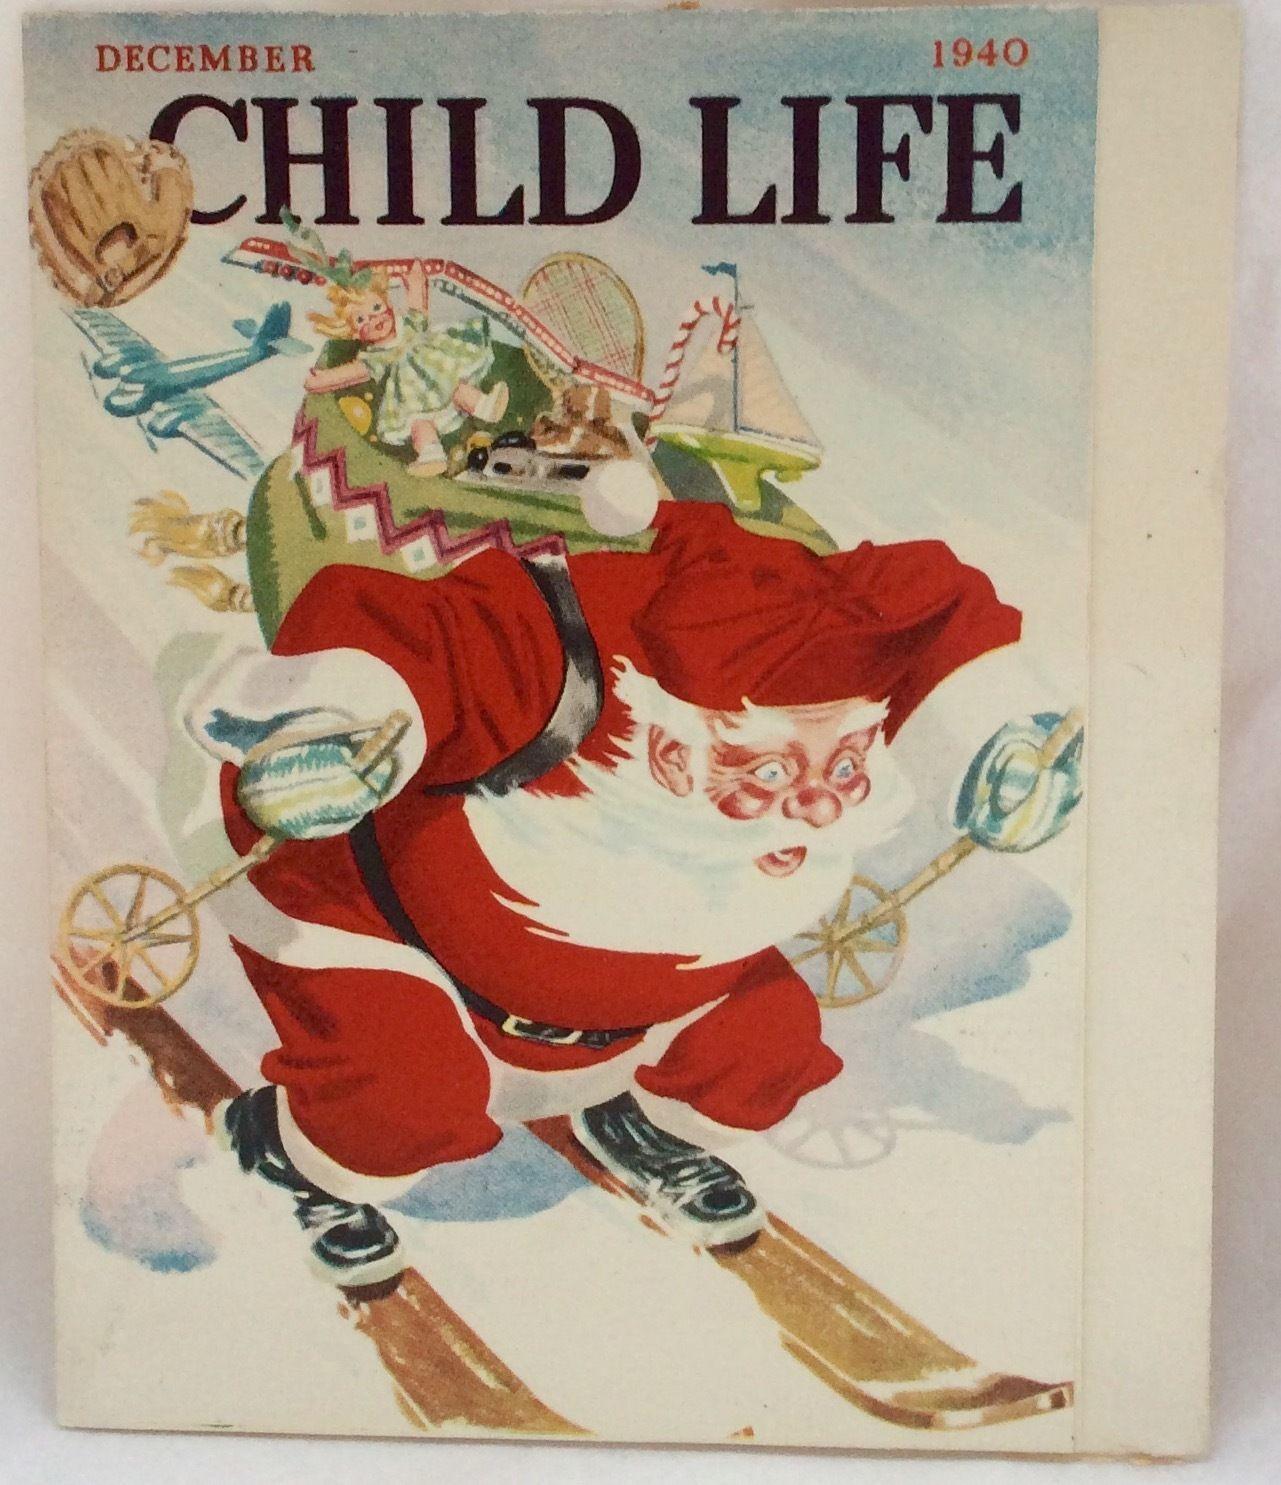 1940 Child Life Magazine Santa Skiing Backpack Vintage Christmas ...